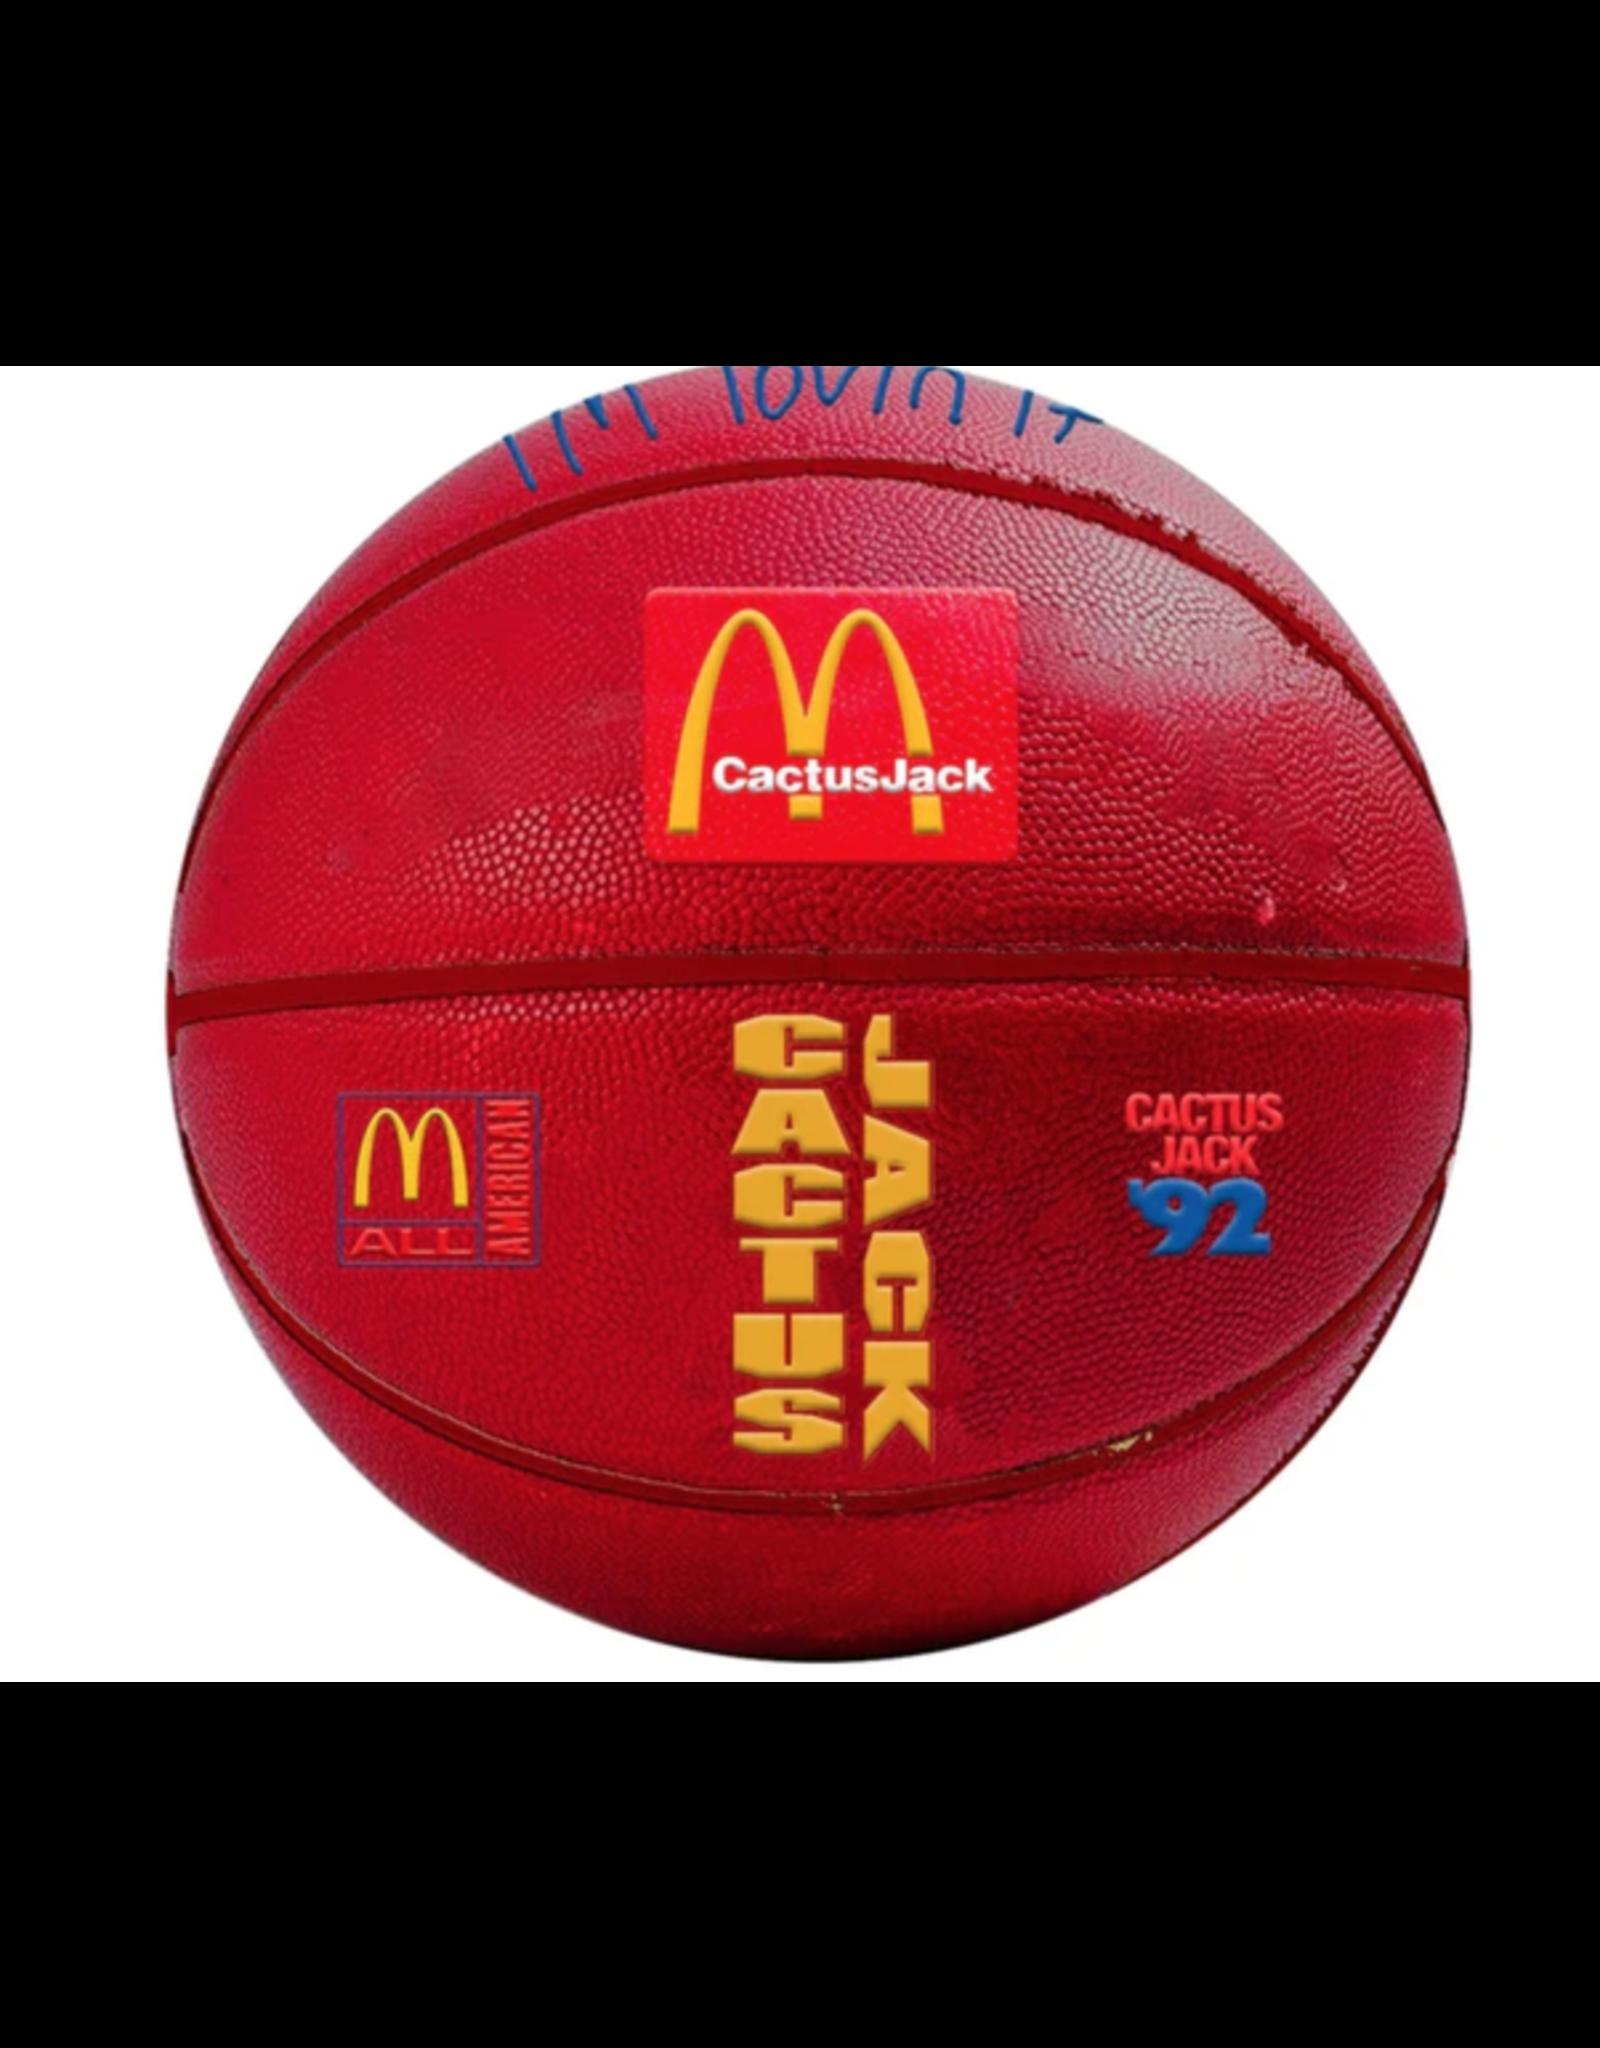 TRAVIS SCOTT Travis Scott x McDonalds All American 92' Basketball